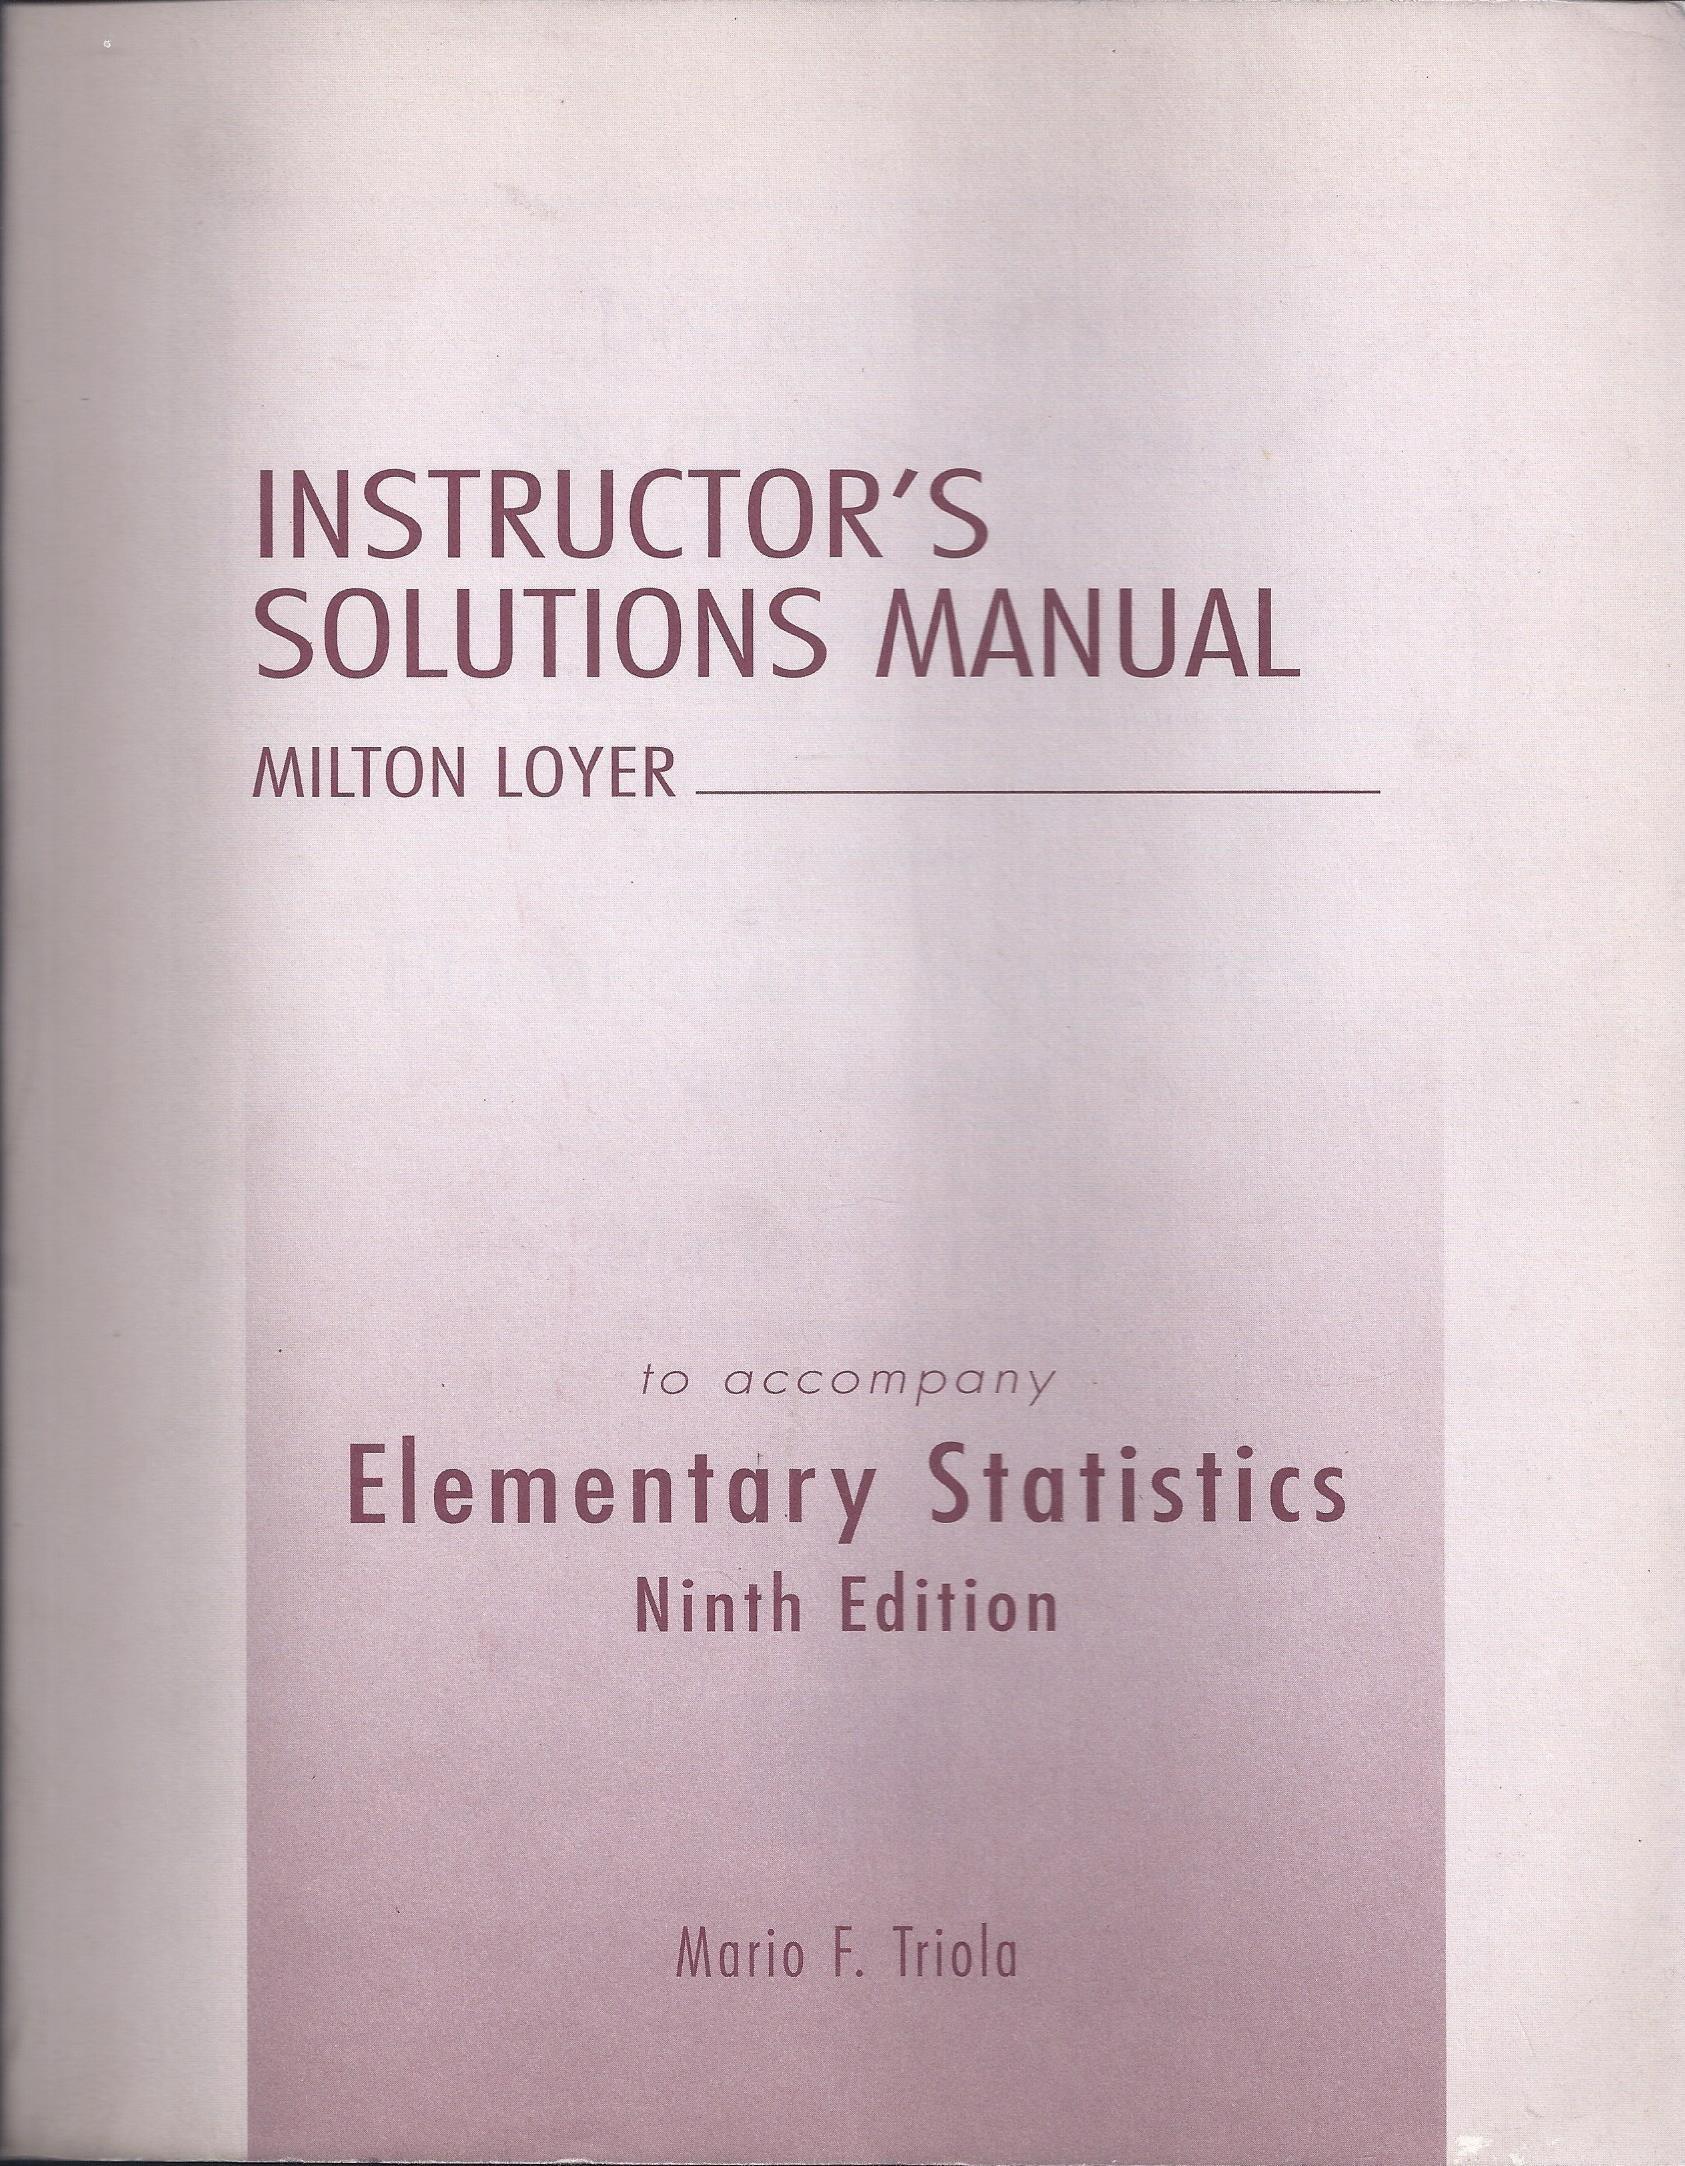 Elementary Statistics: Instructor's Solutions Manual: Mario F. Triola:  9780321122124: Statistics: Amazon Canada